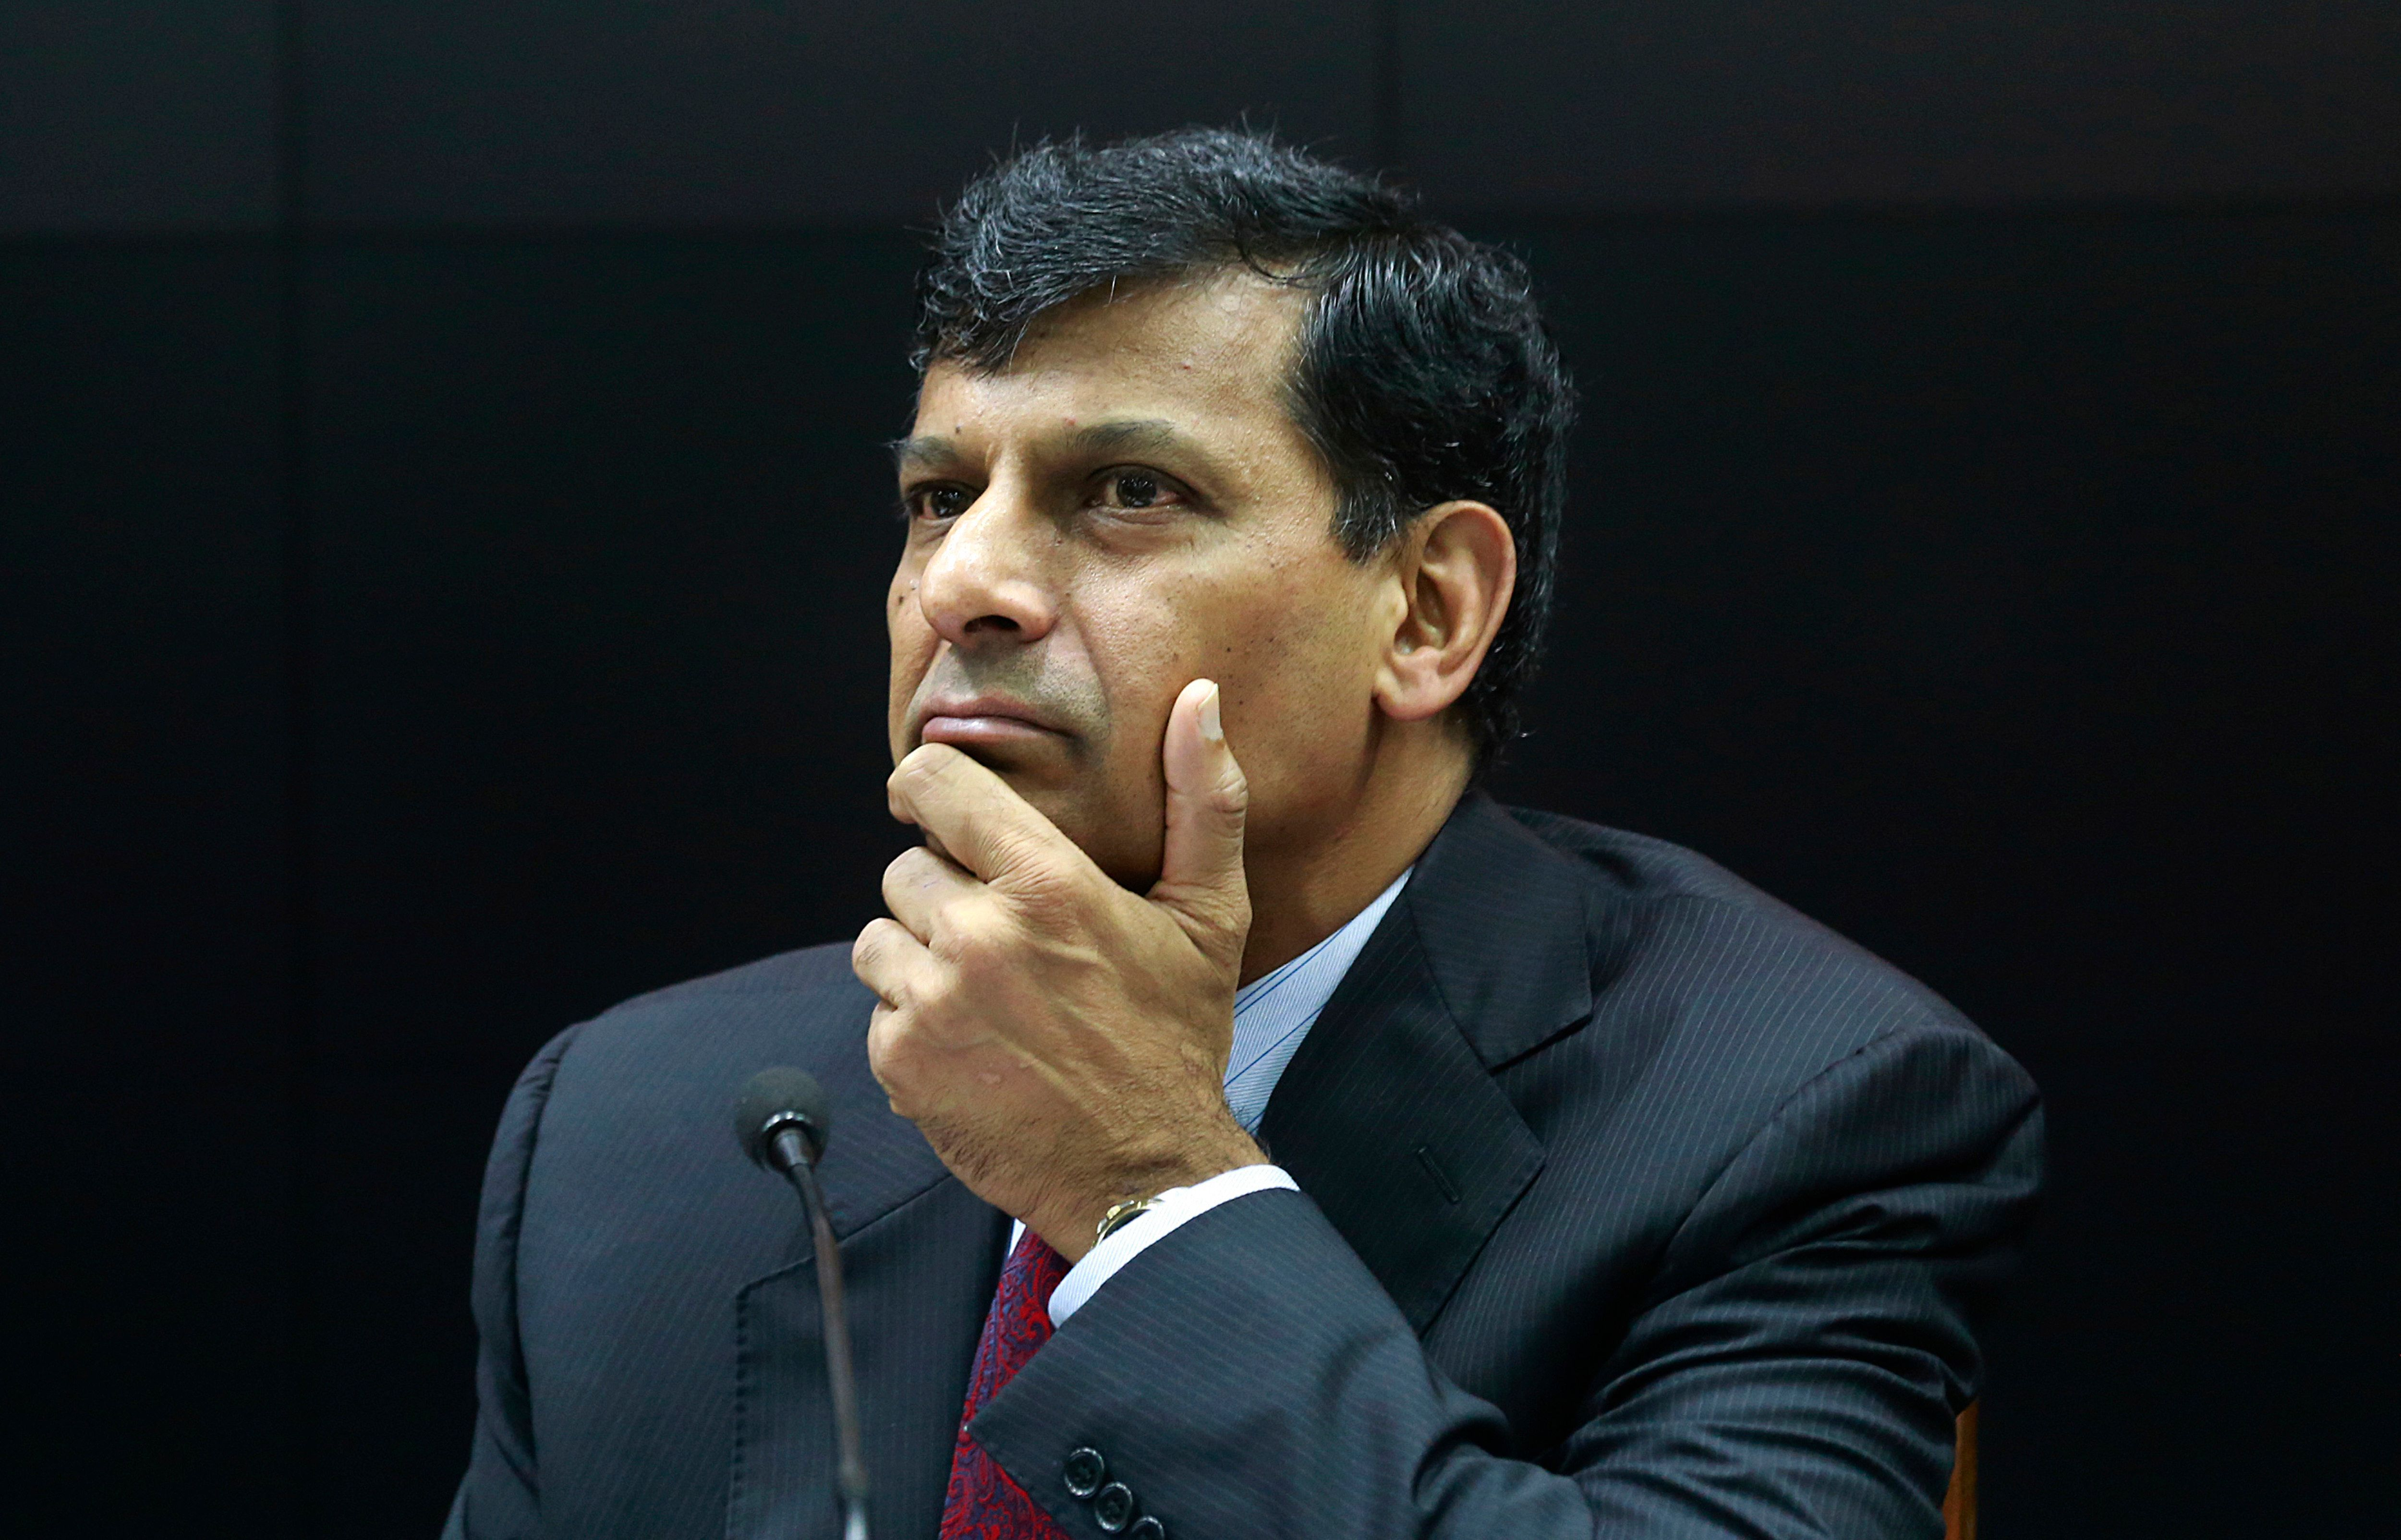 Demonetisation Slowed Down India's Economic Growth: Raghuram